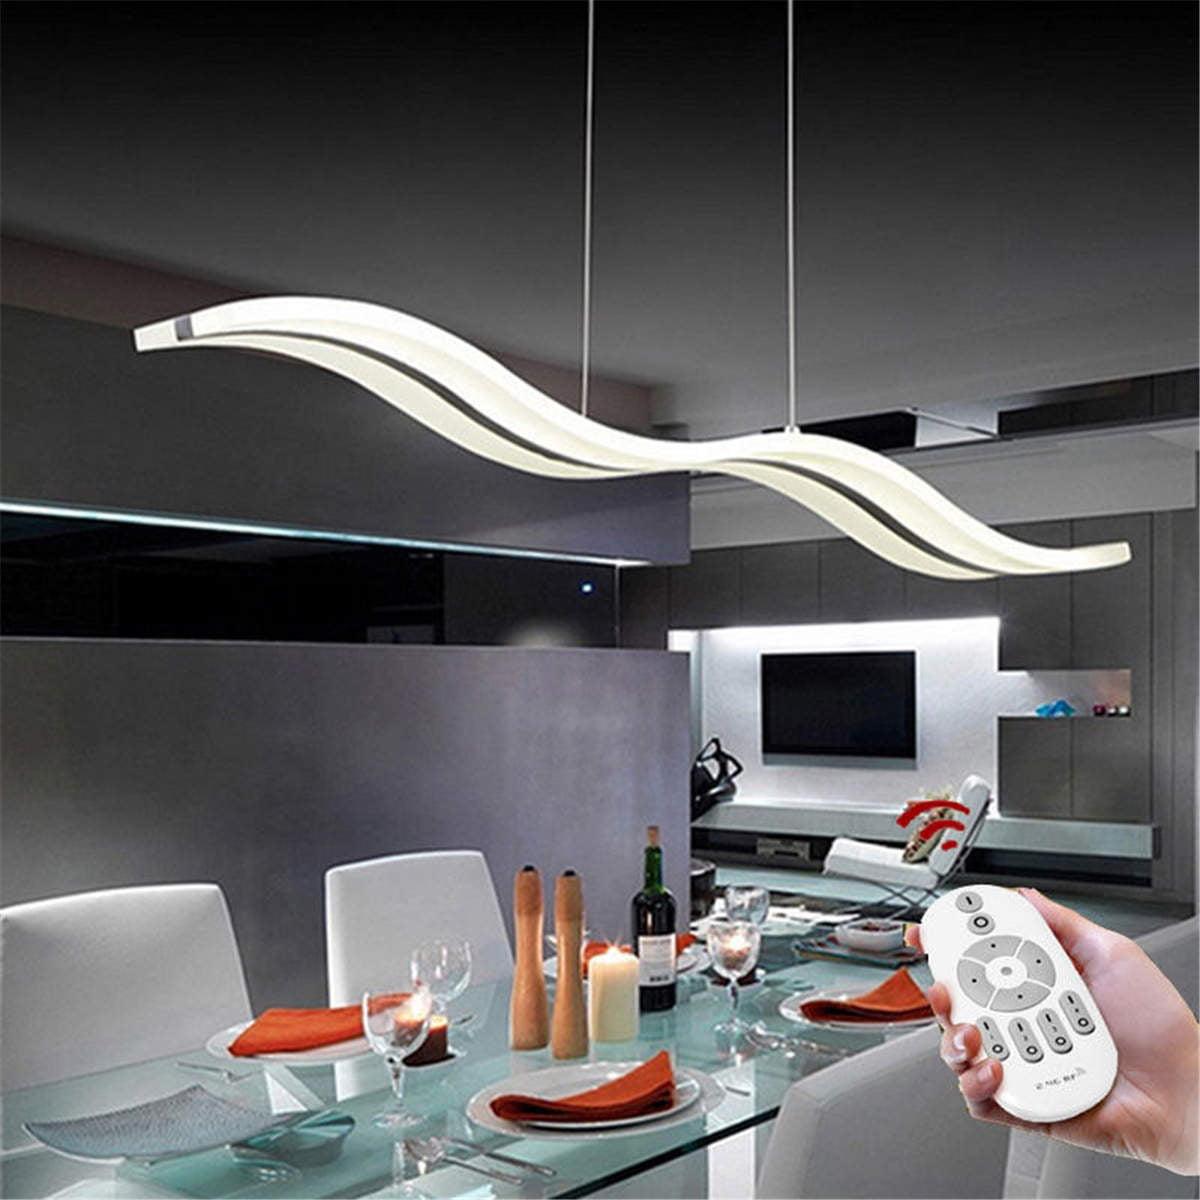 Led Pendant Light Modern Wave Design Ceiling Light Chandelier Fixture Minimalist Art Acrylic Lamp Living Room Dining Room Office Home Decor Walmart Canada